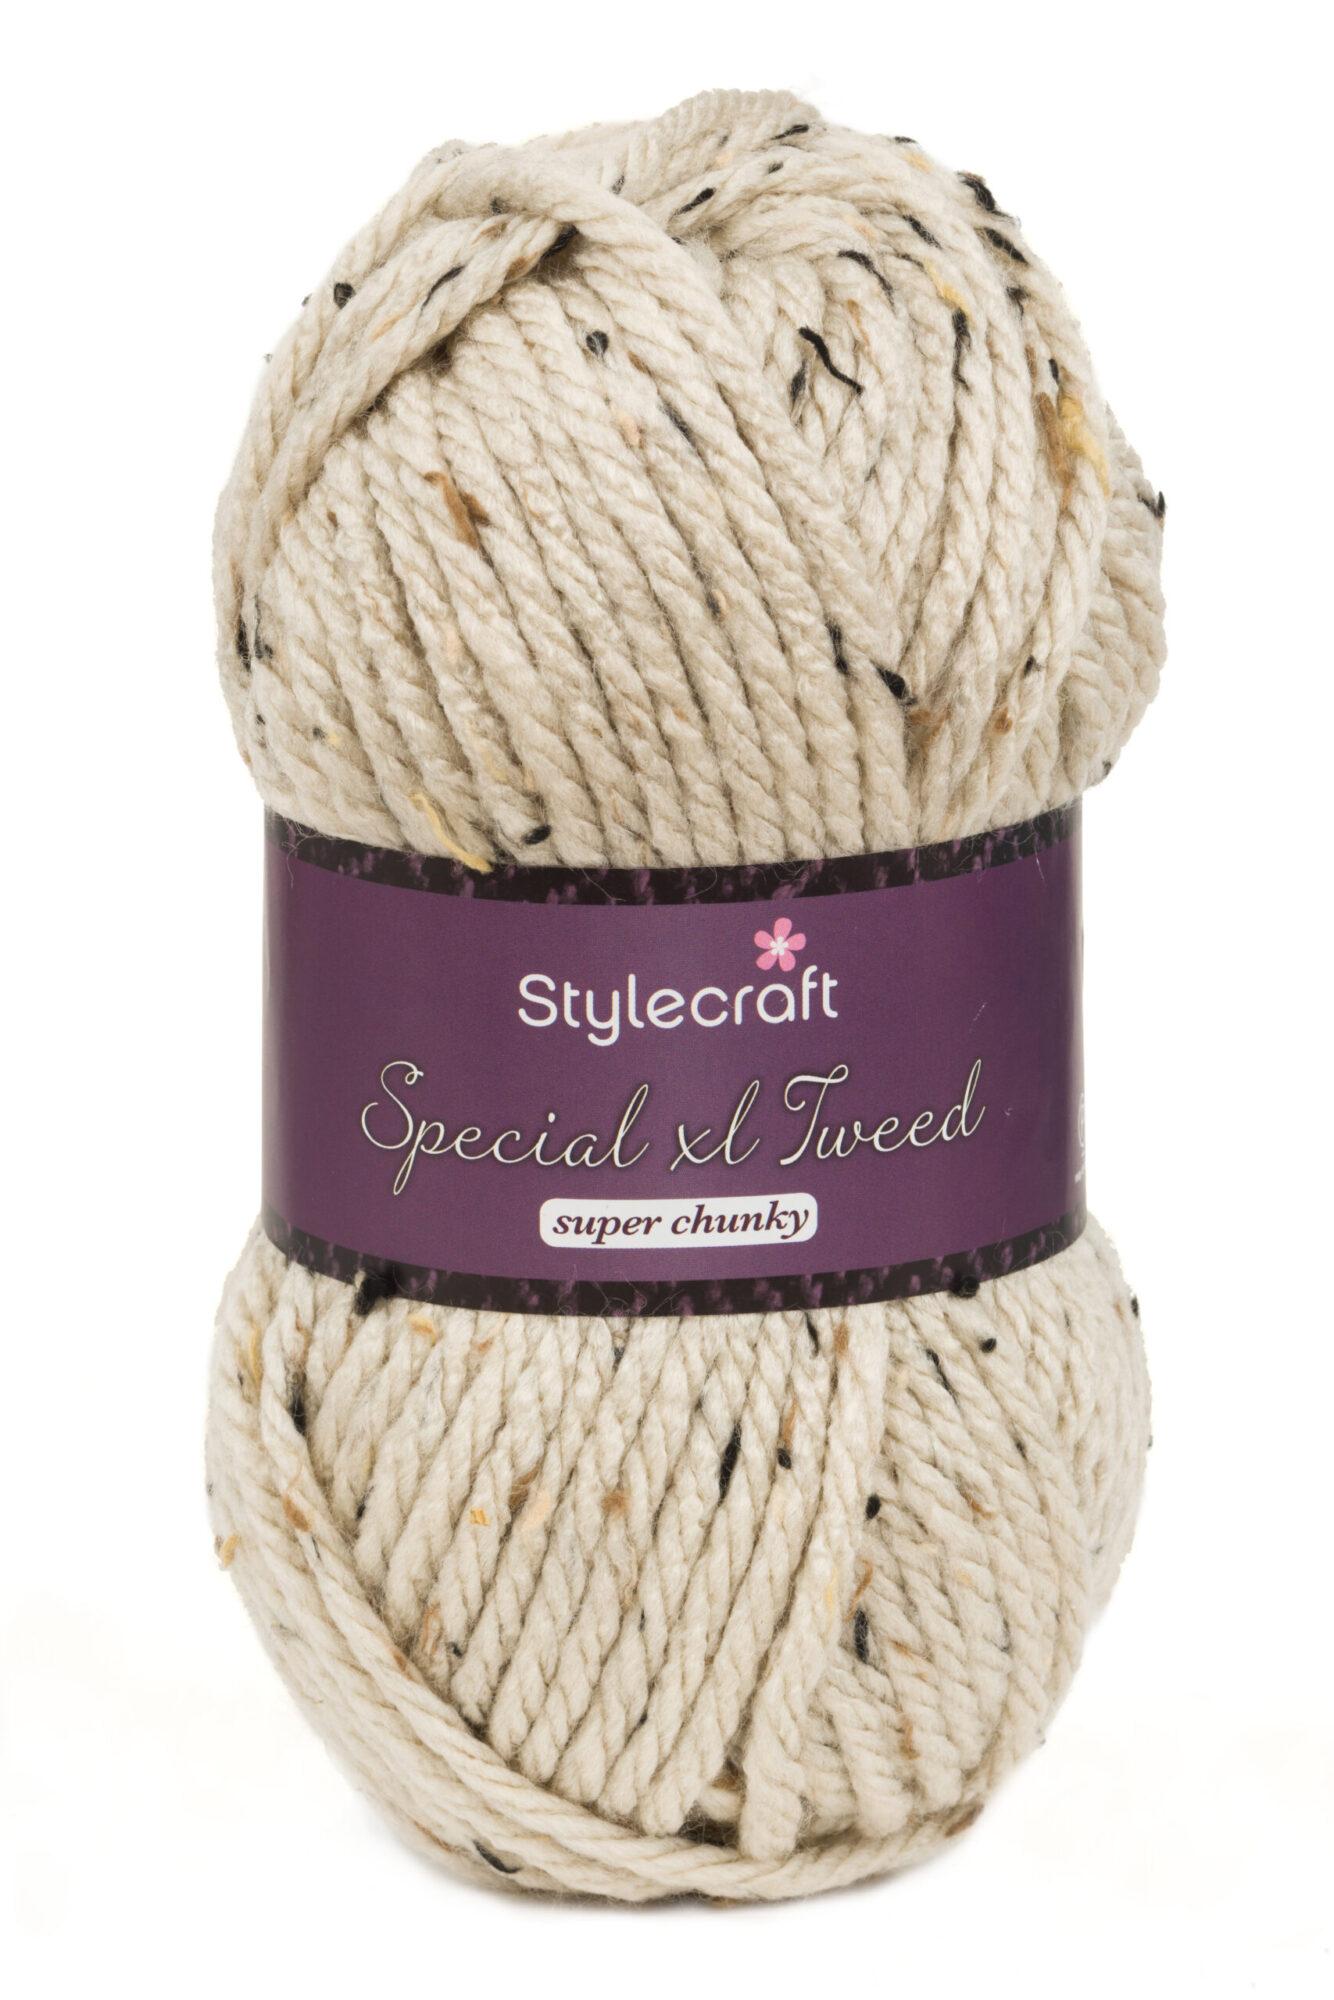 Stylecraft Special XL Tweed product image